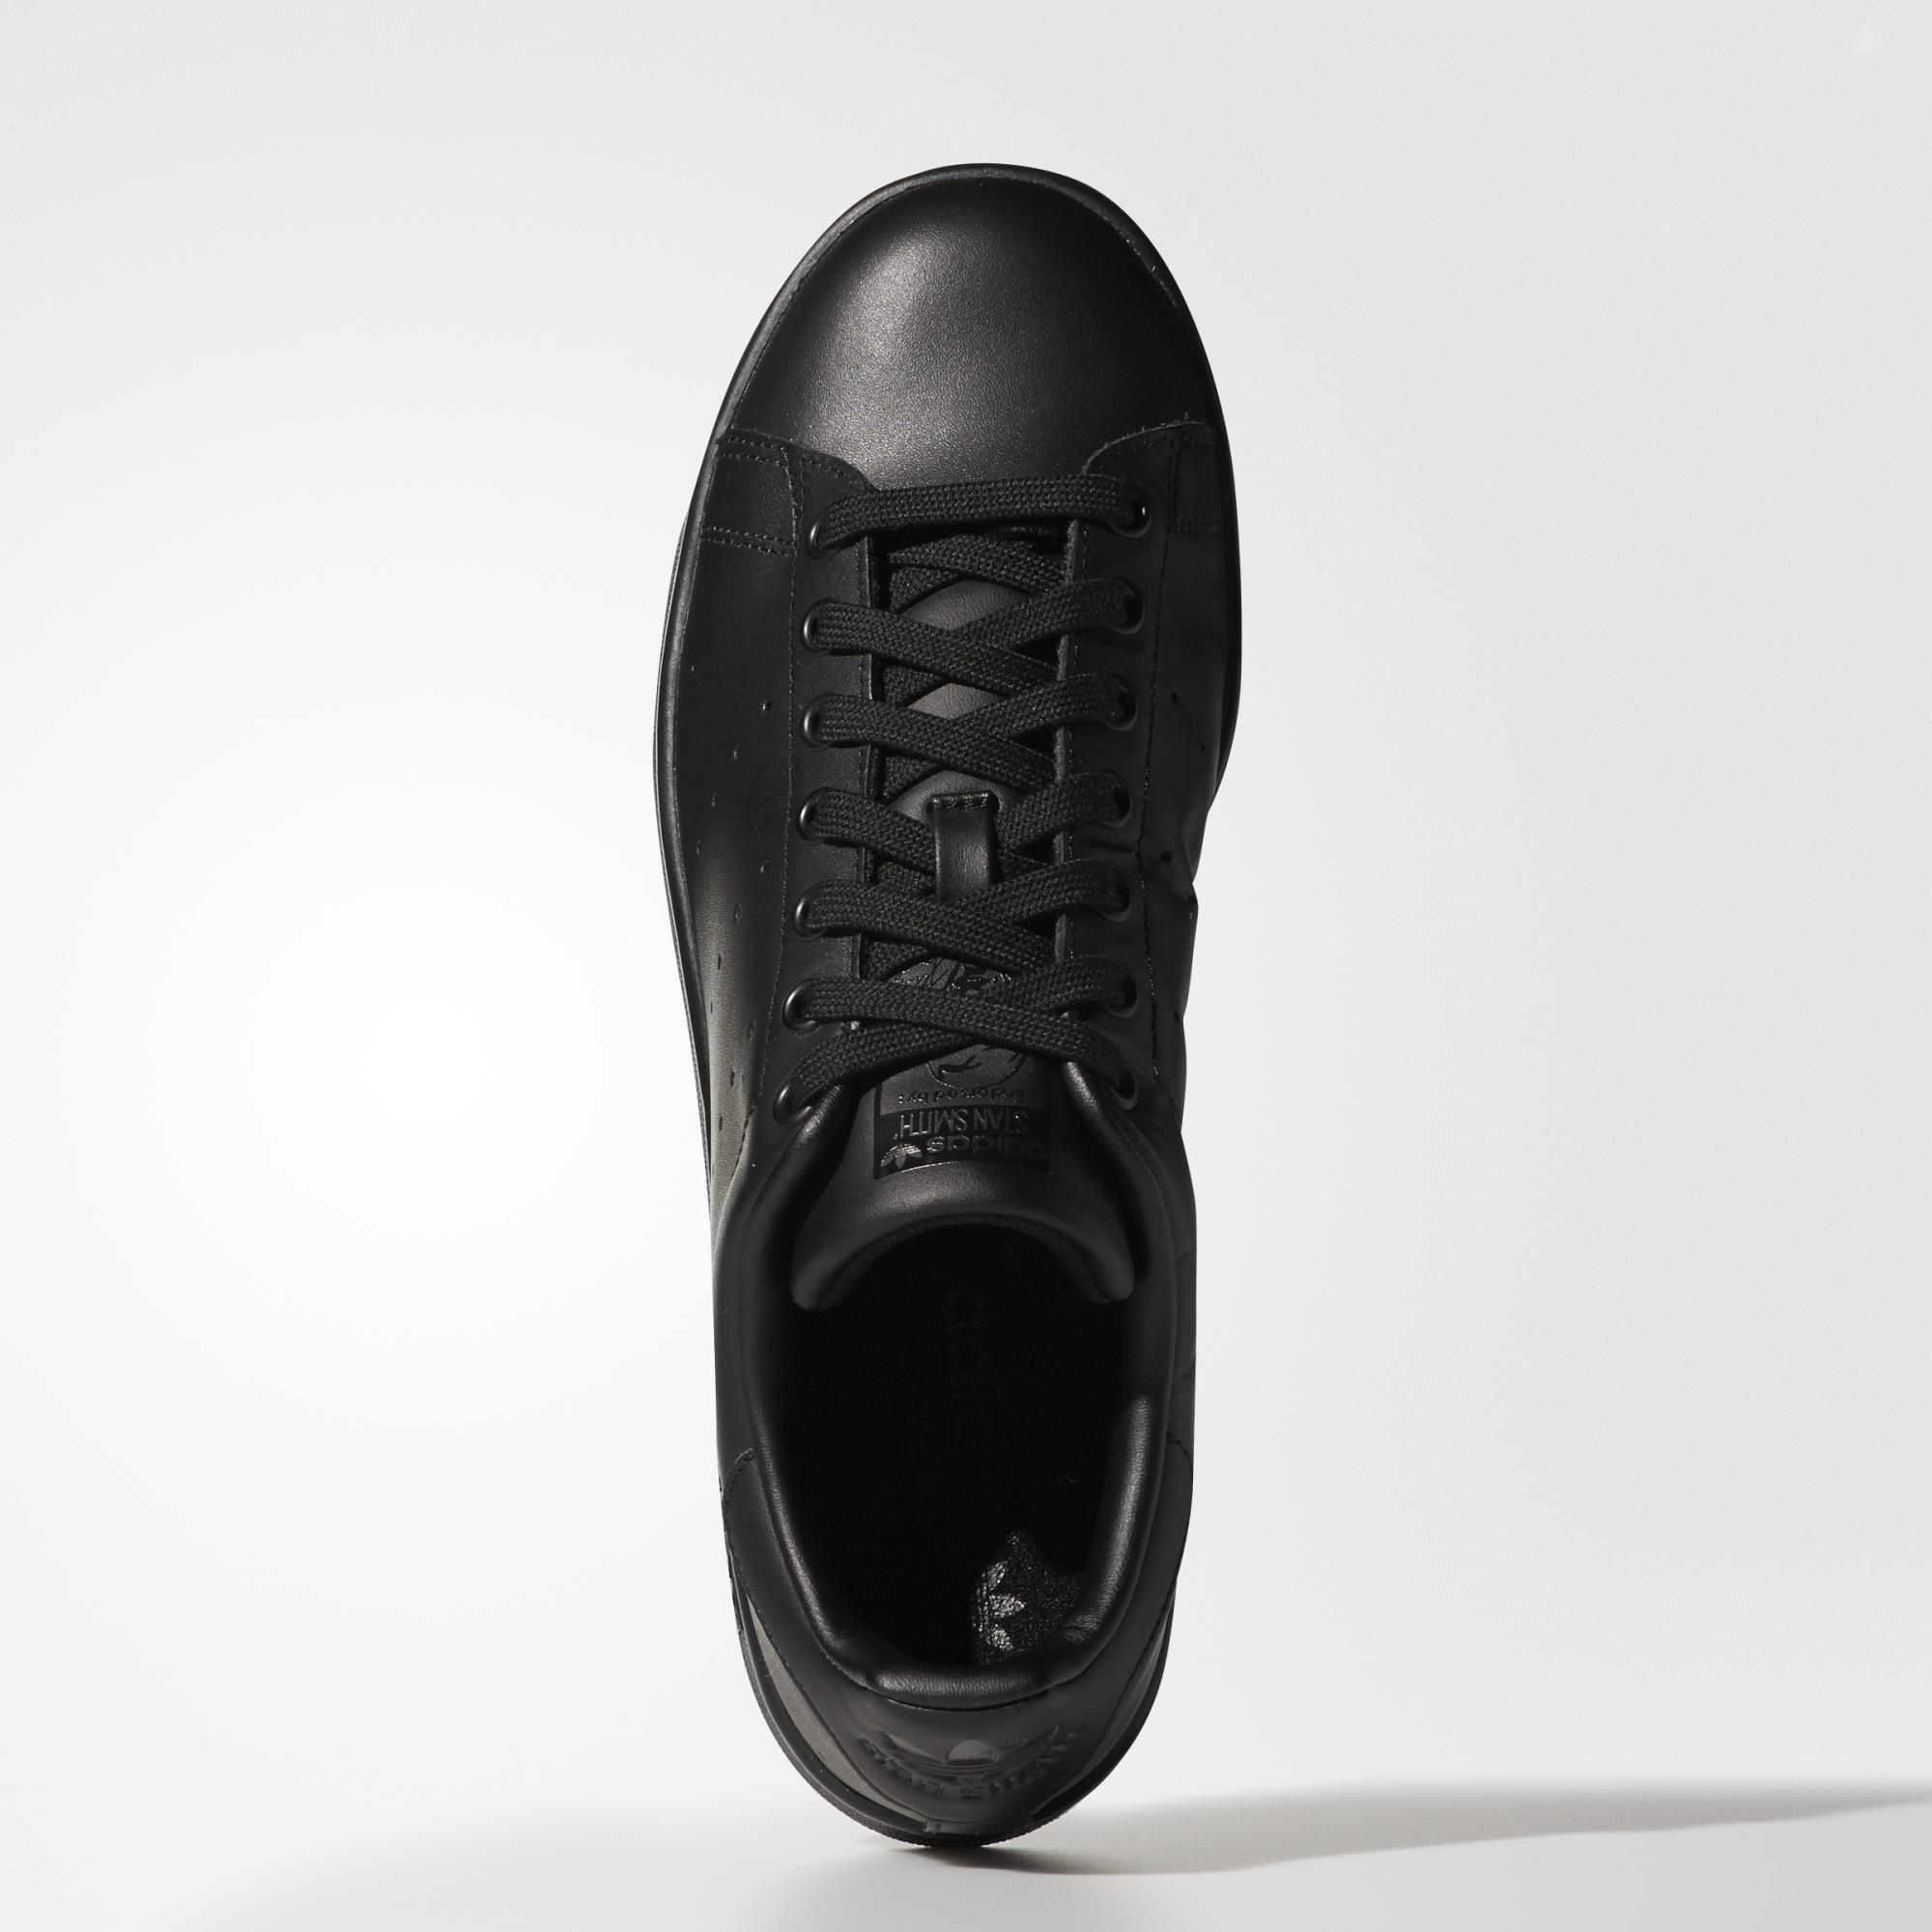 Adidas Stan Smith Shoes Black Adidas Us Adidas Shoes Stan Smith Stan Smith Shoes Black Leather Sneakers